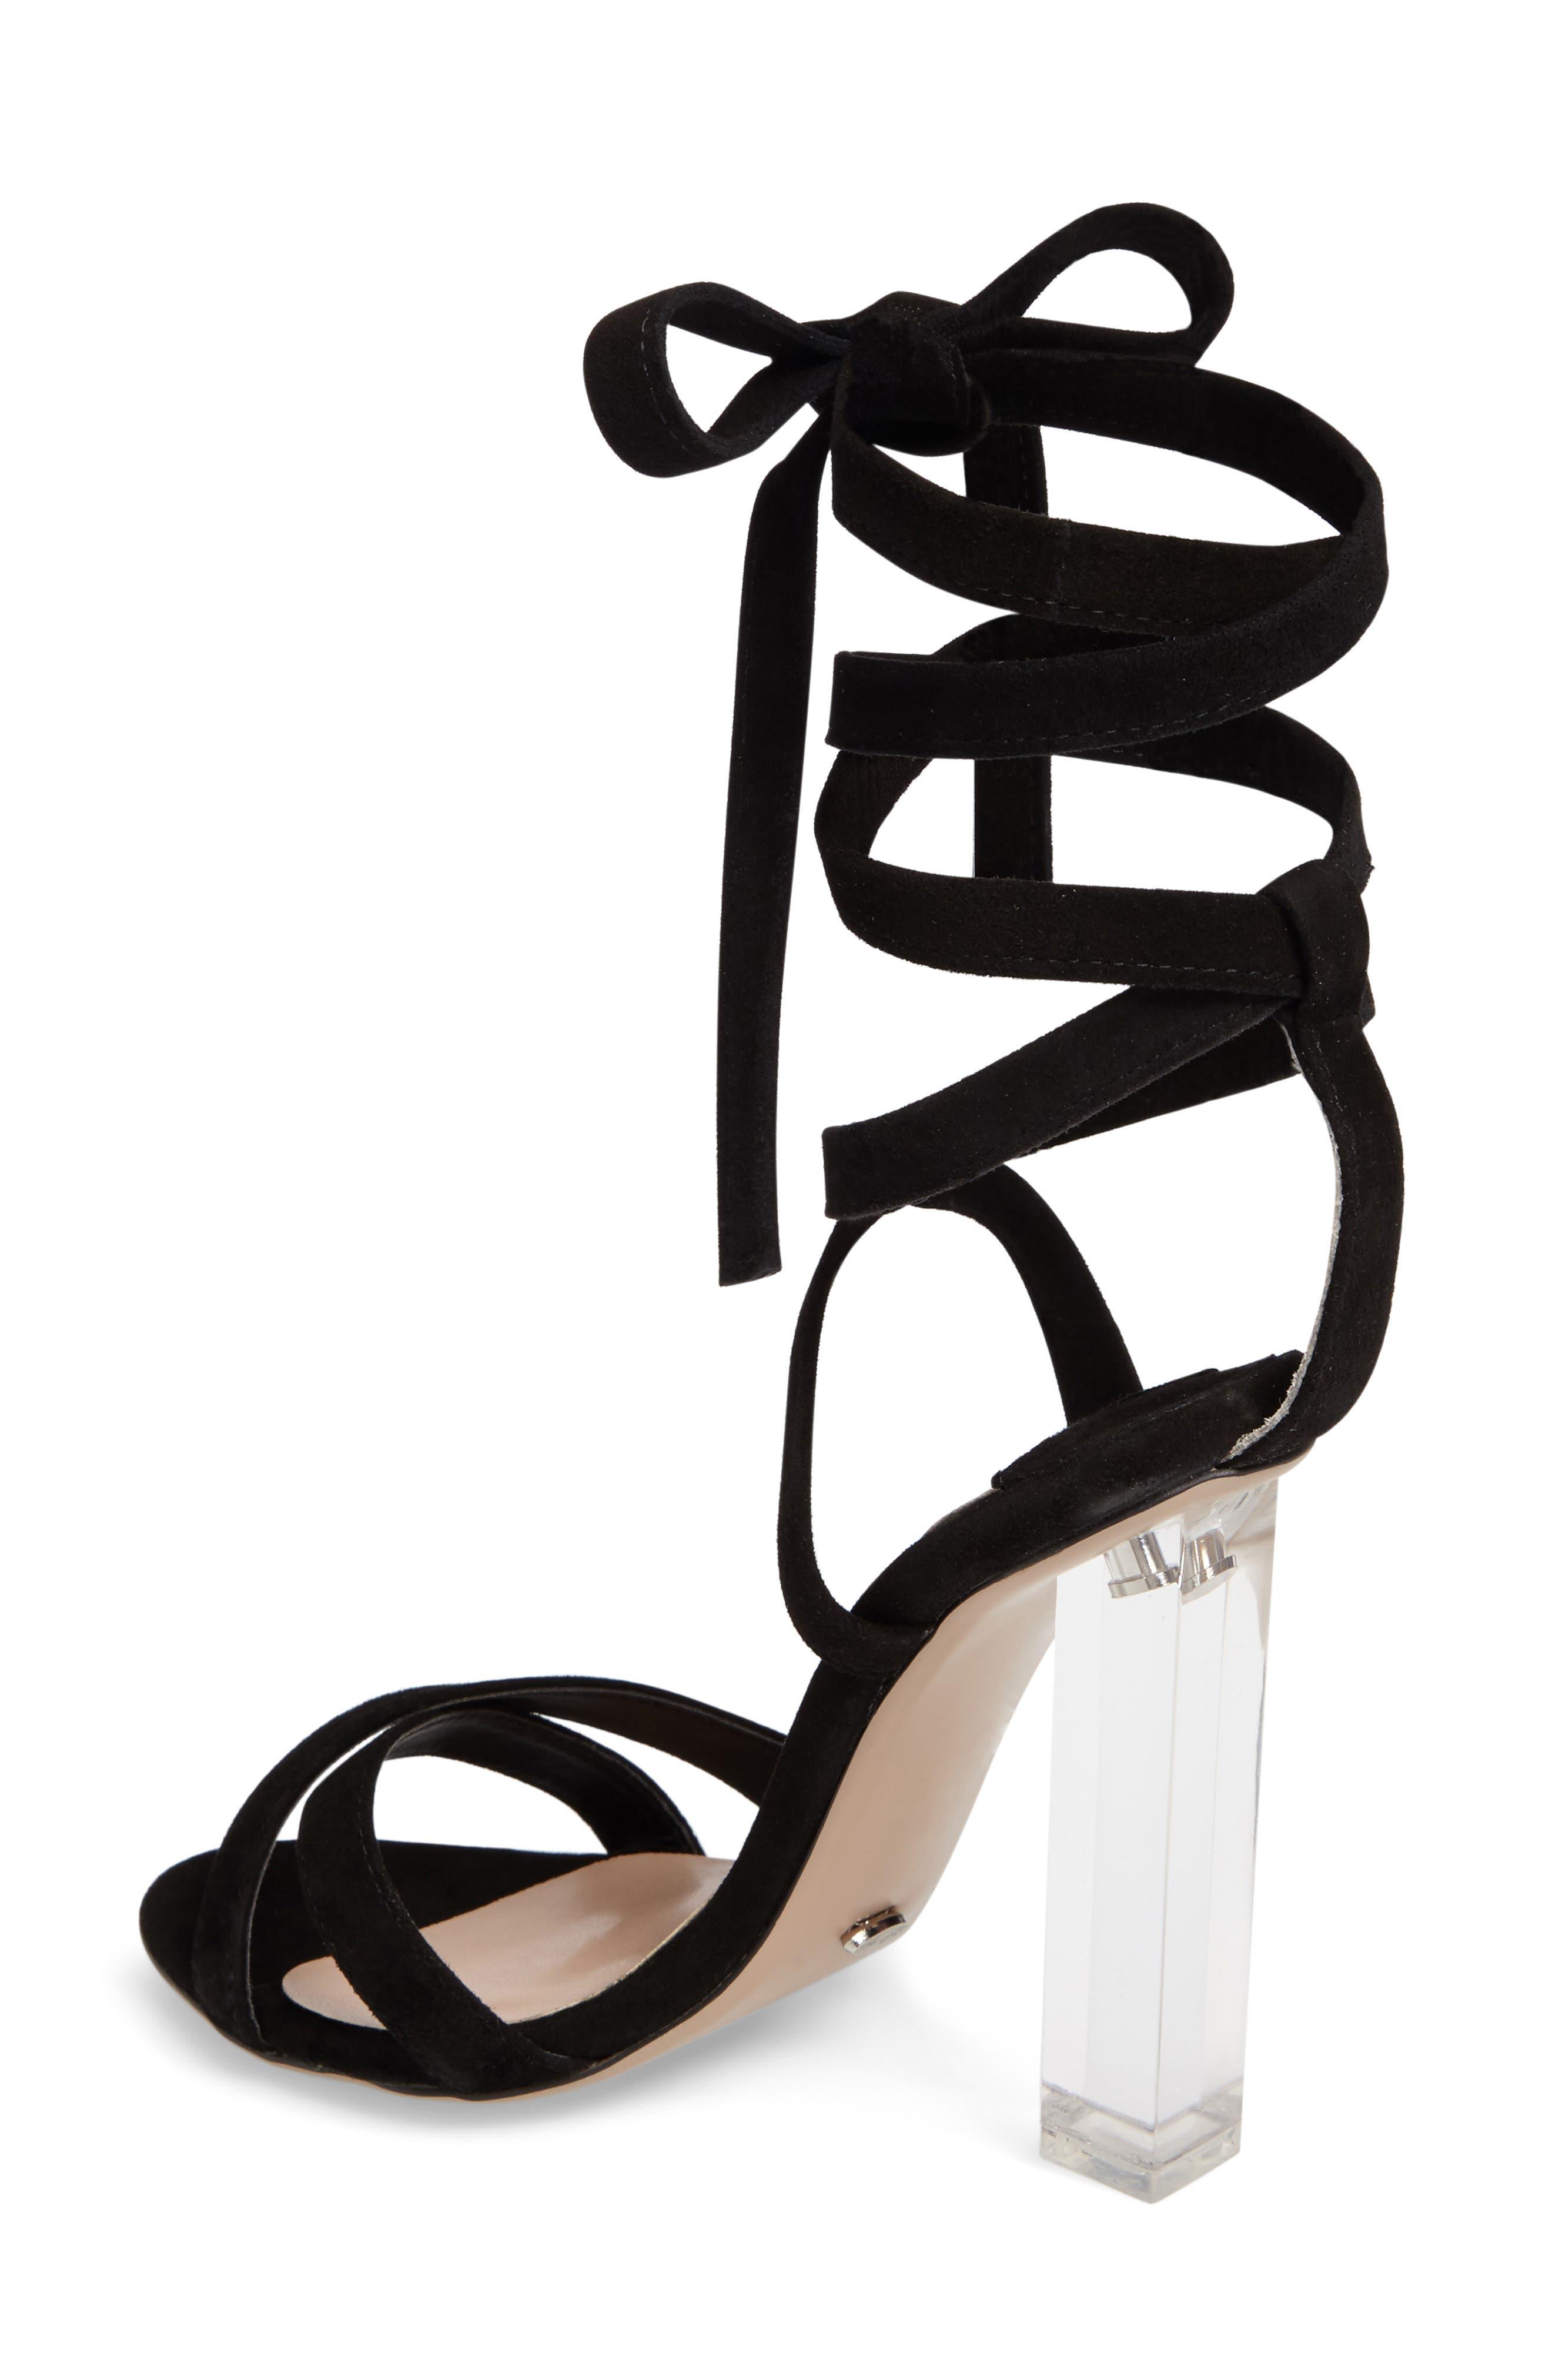 Komma Translucent Heel Sandal,                             Alternate thumbnail 2, color,                             001